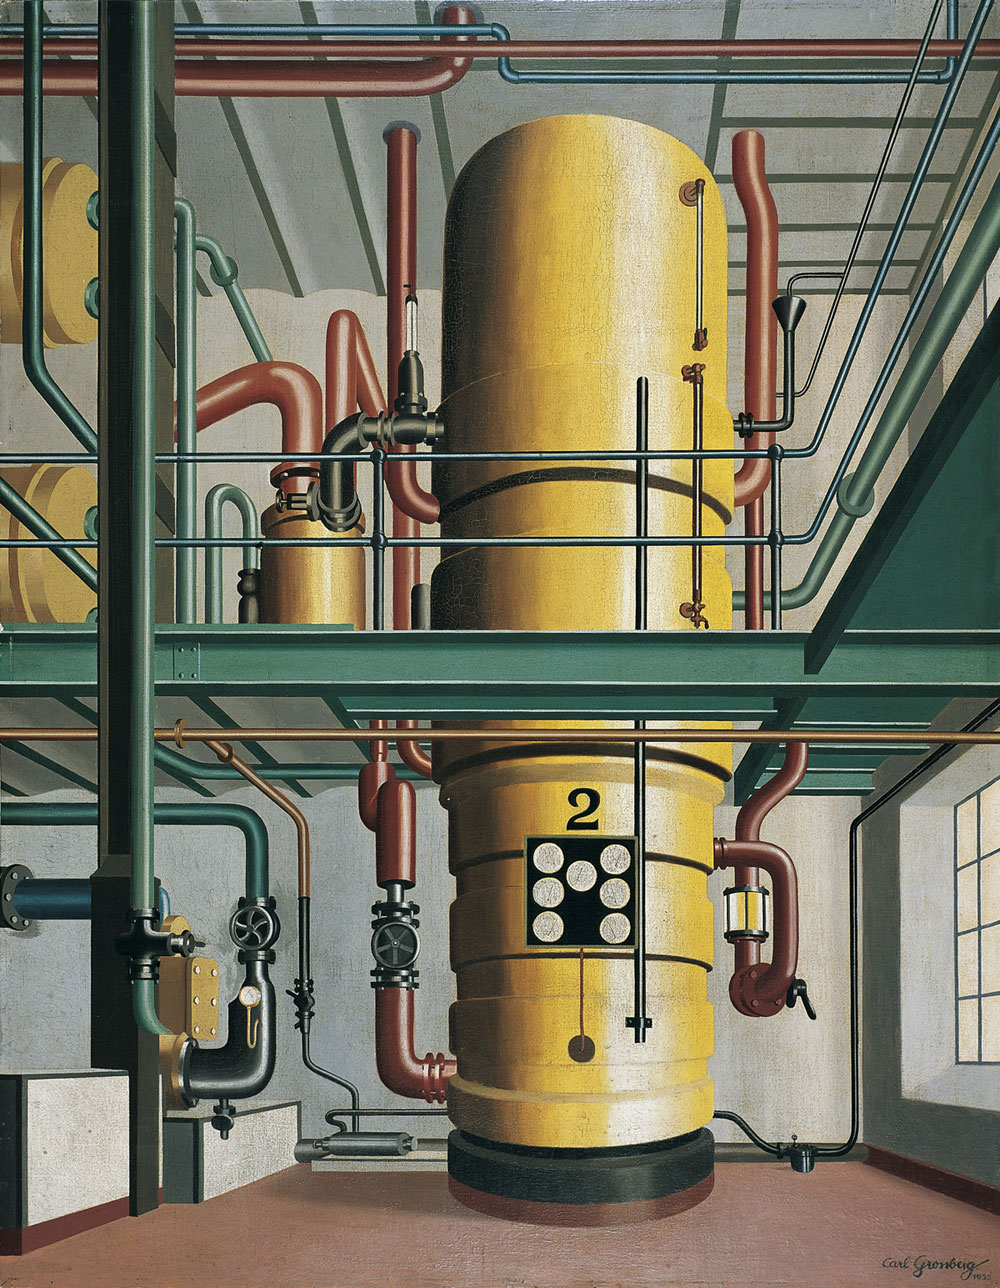 Carl Grossberg, The Yellow Boiler (Der Gelbe Kessel), 1933. Oil on wood. Von der Heydt-Museum Wuppertal, Germany